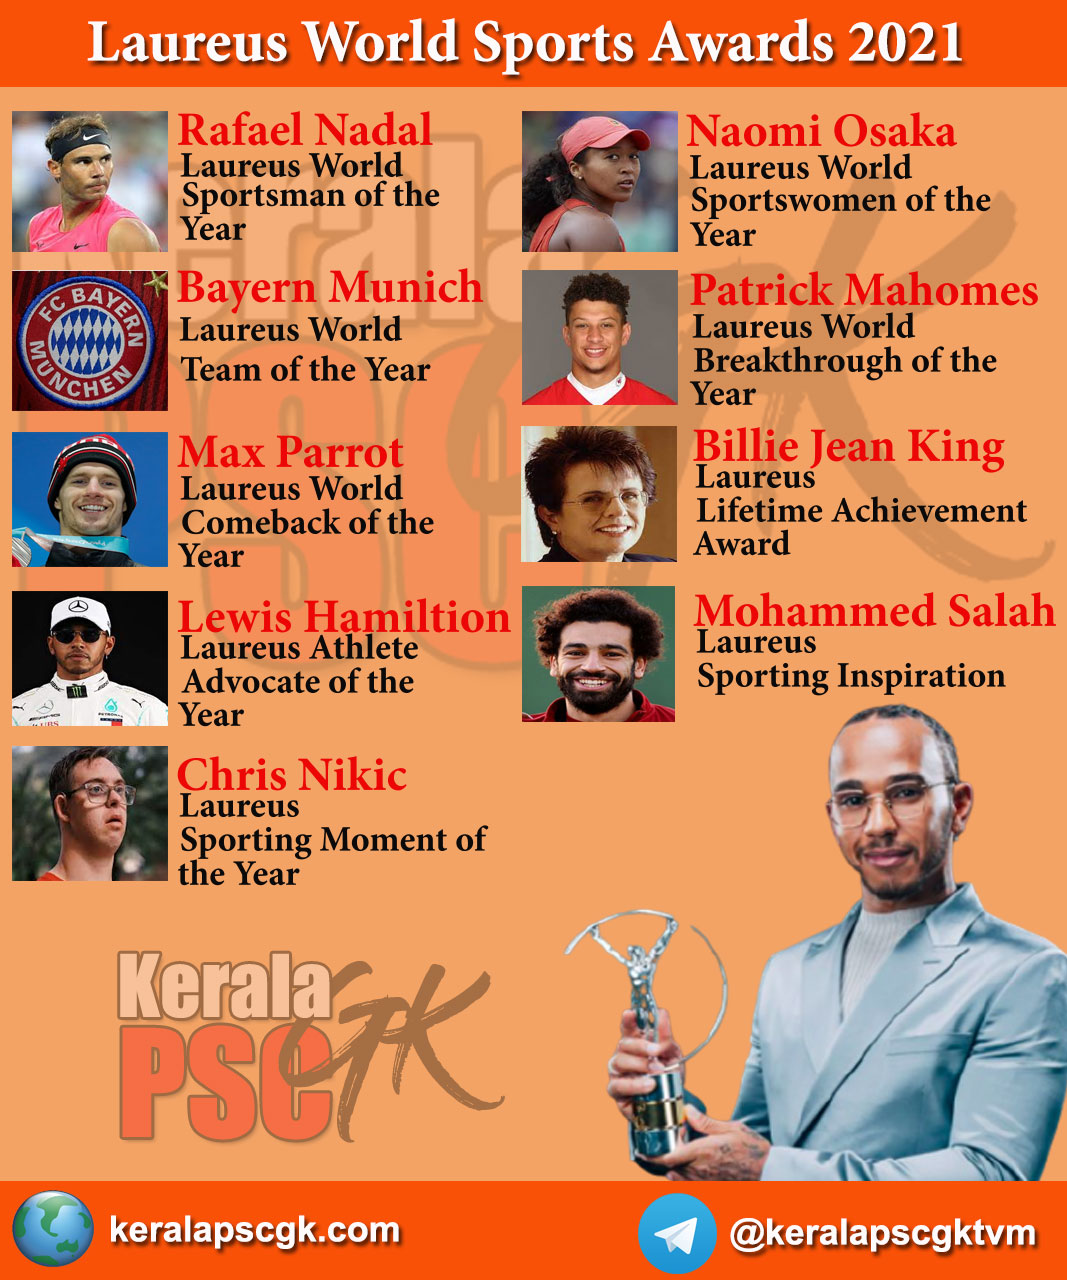 List of Laureus World Sports Awards 2021 winners